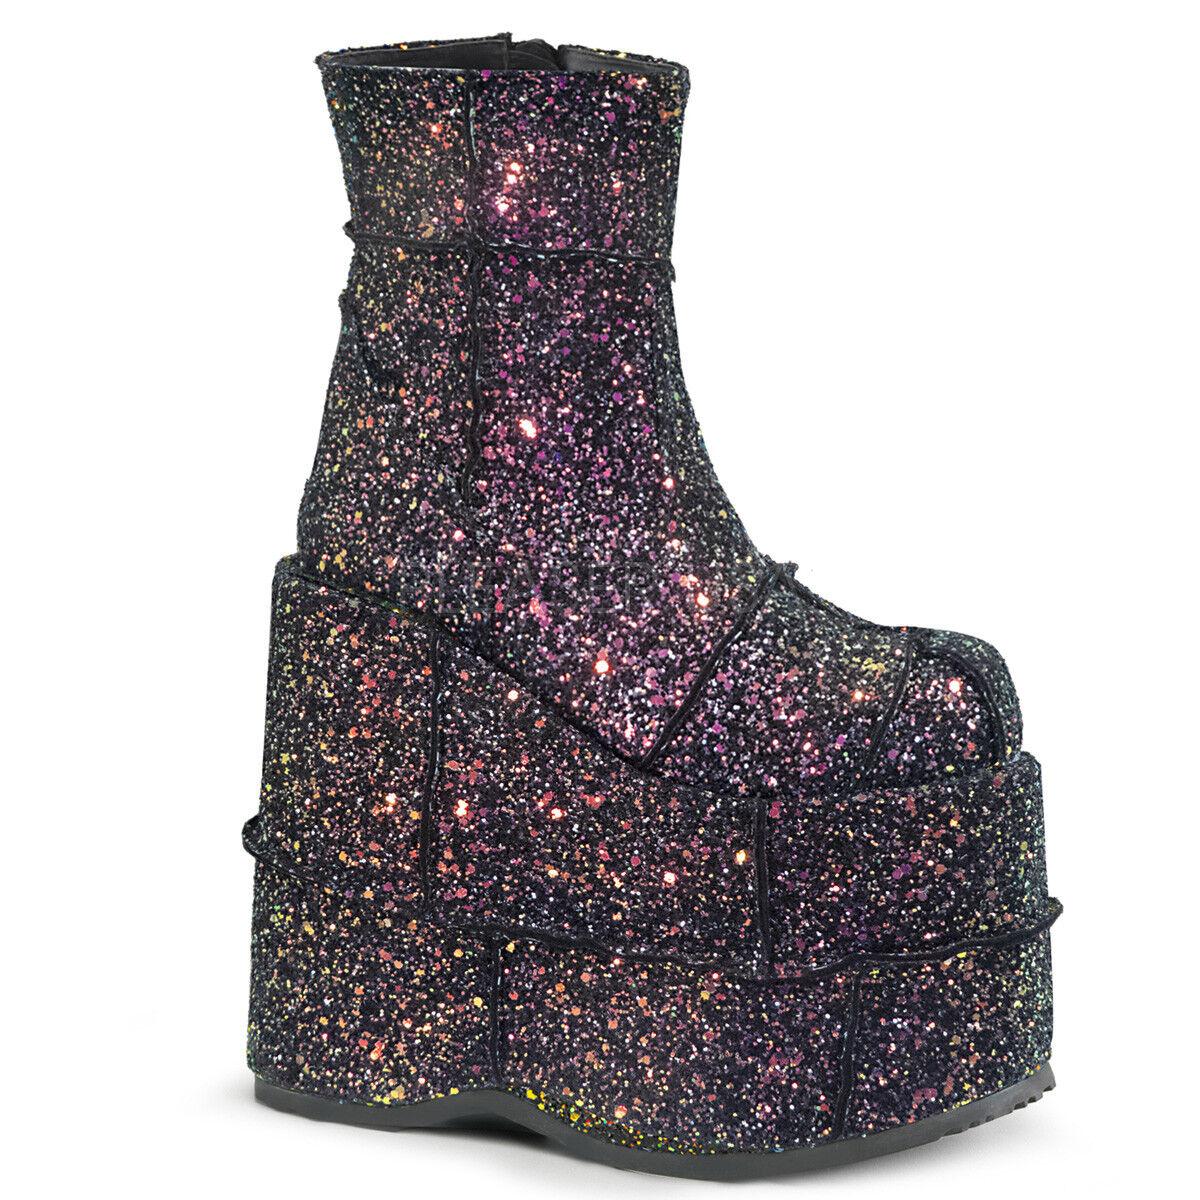 DEMONIA STACK-201G 7  Wedge Platform Black Multi Glitter Womens Ankle Gogo Boots